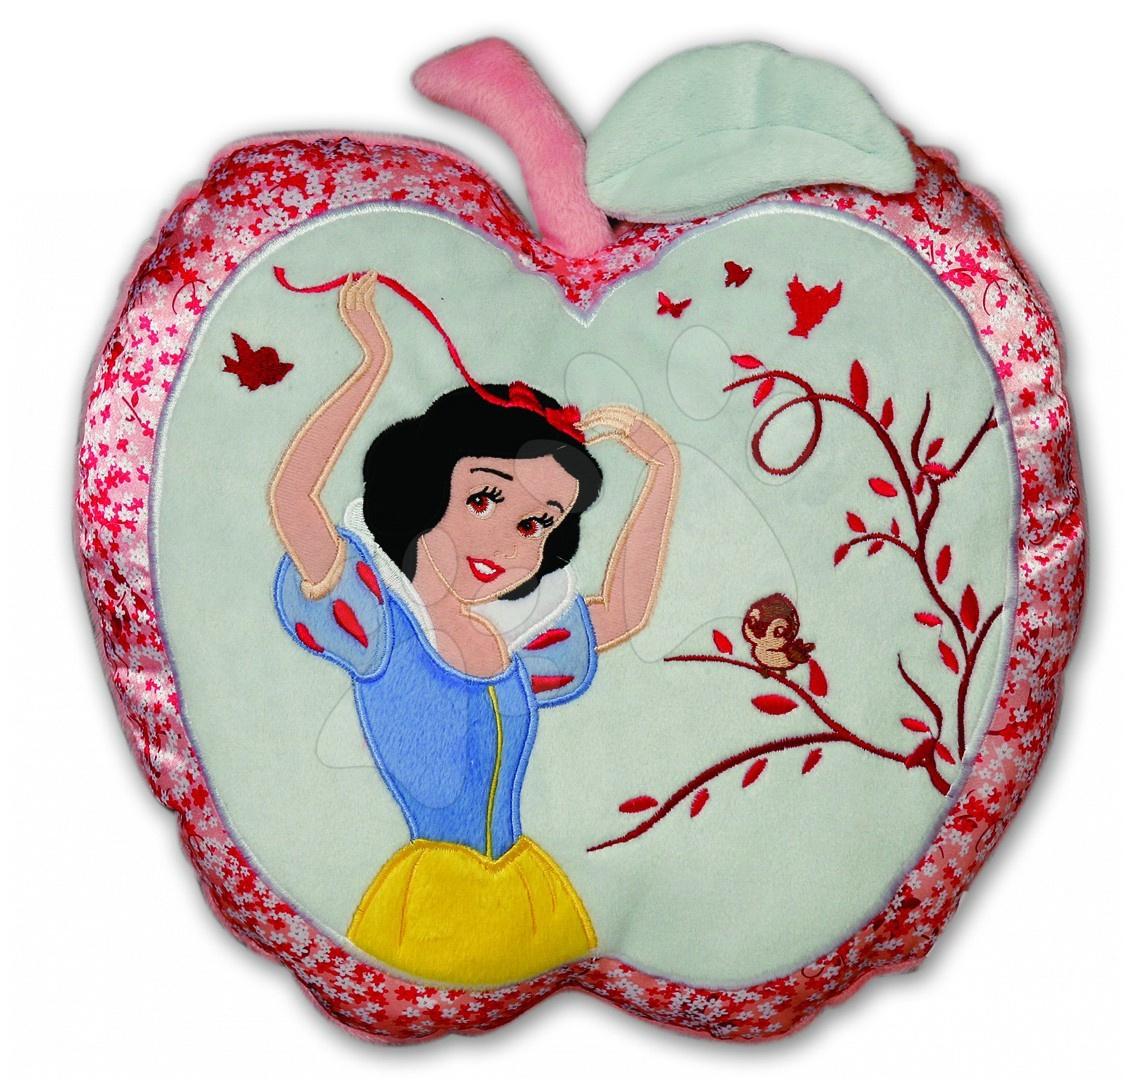 Vankúš Princezné Snehulienka Ilanit jabĺčko 46 cm zelený